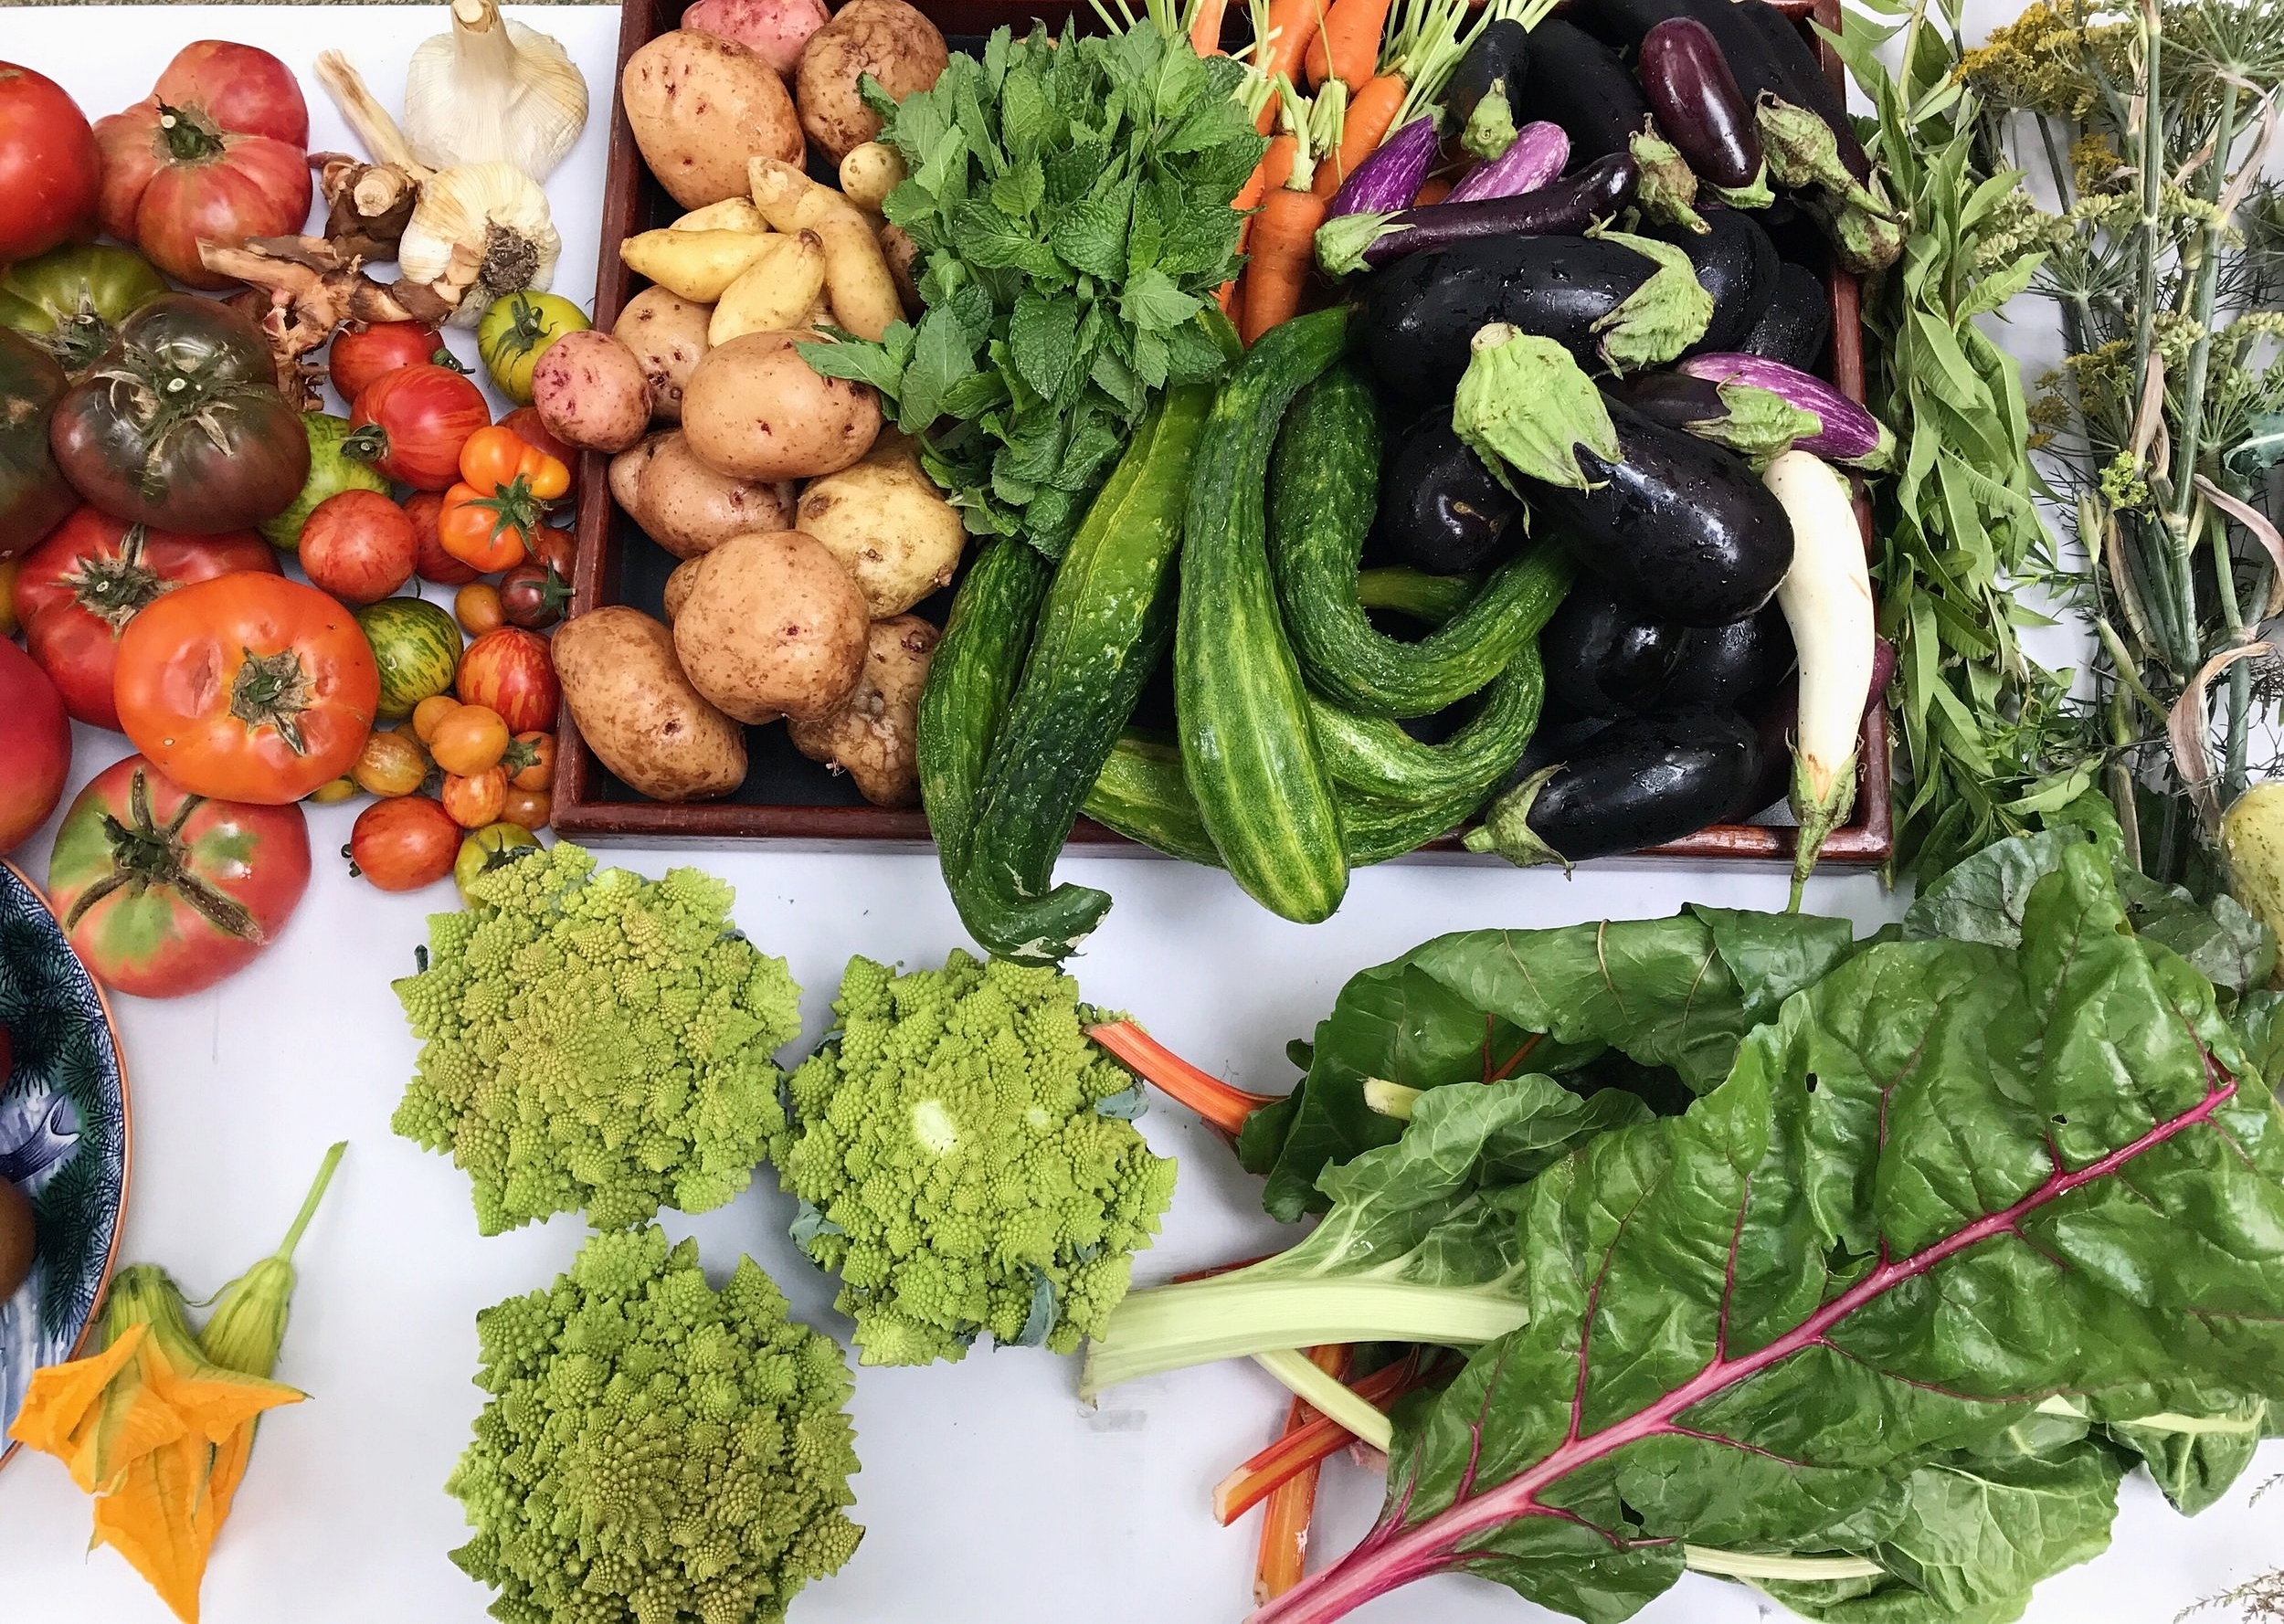 Daily cooking school ingredients